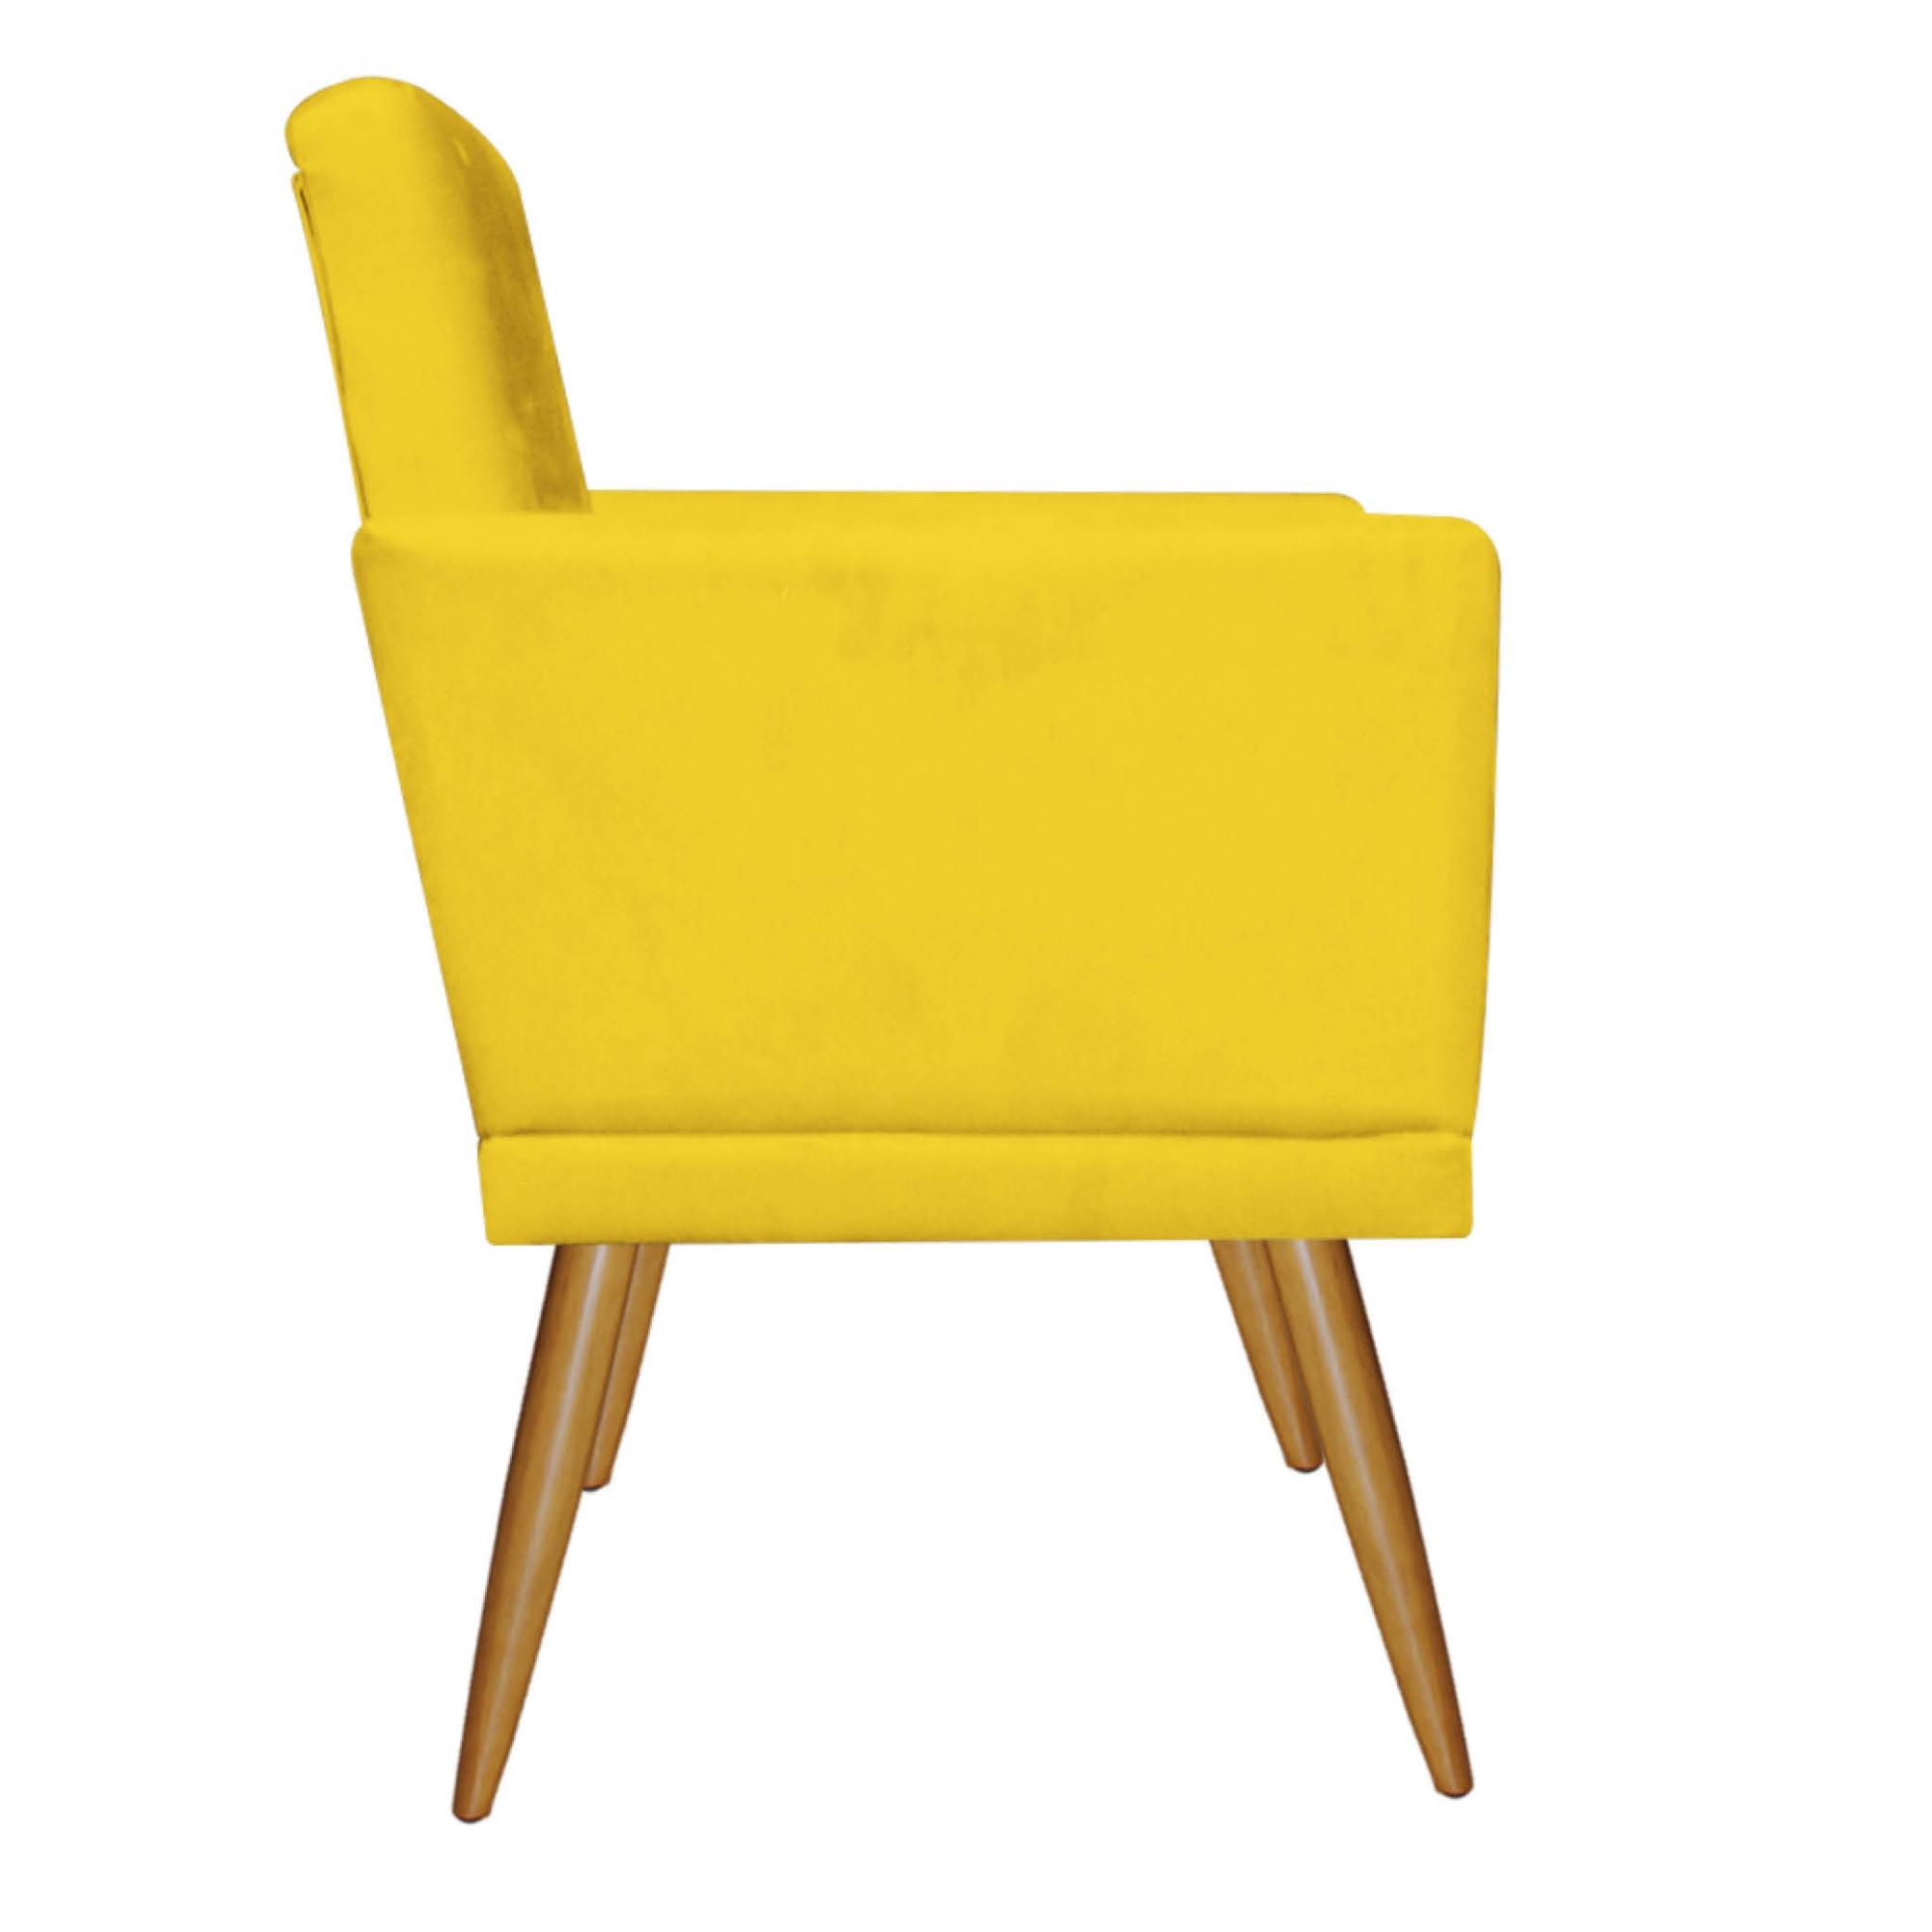 Kit 02 Poltrona Decorativa Nina com rodapé Amarelo - Bela Casa Shop